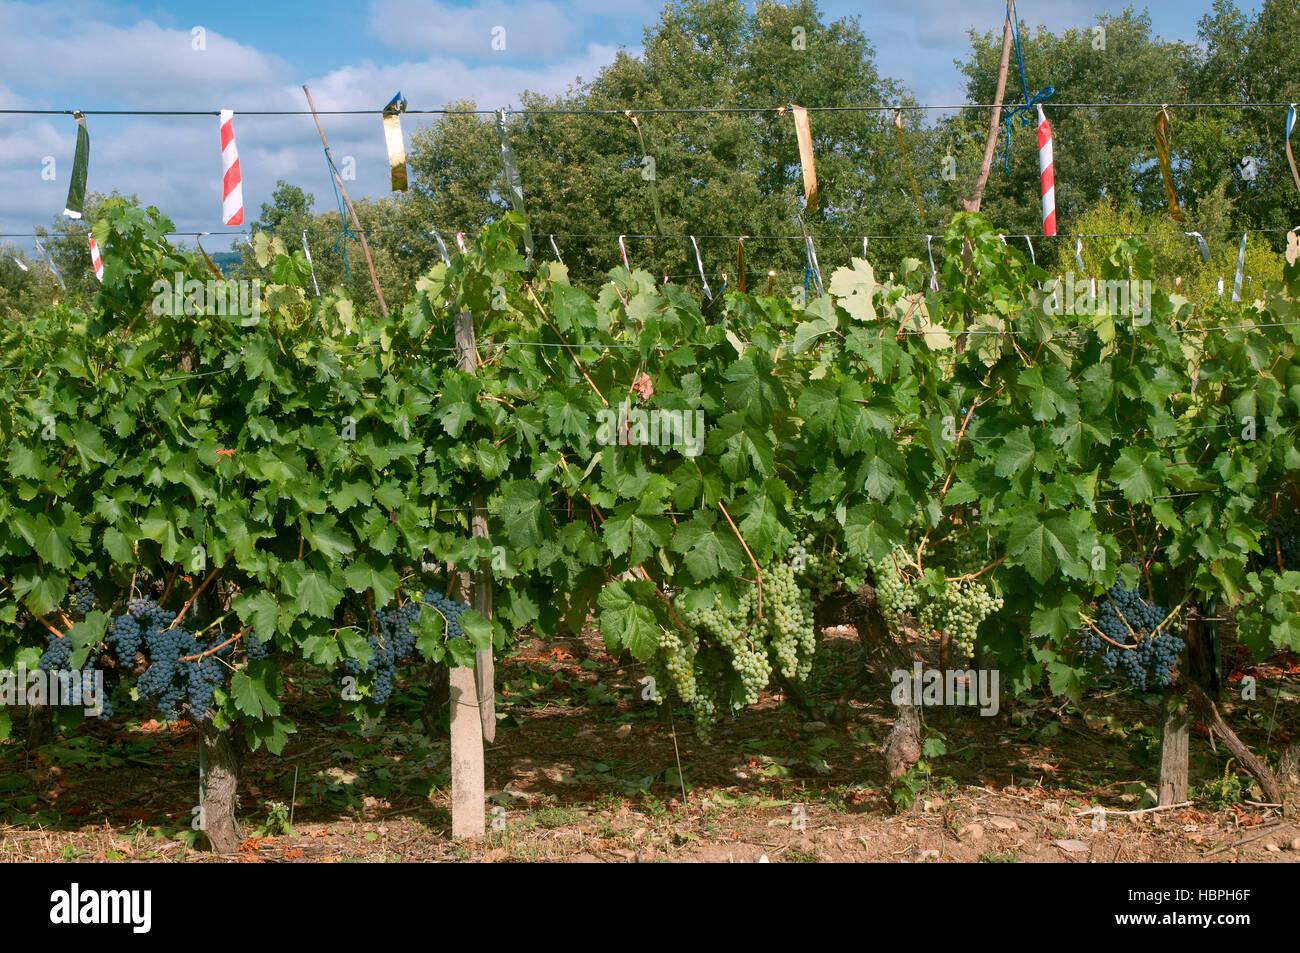 Vineyard, Ribeira Sacra, Sober, Lugo province, Region of Galicia, Spain, Europe - Stock Image